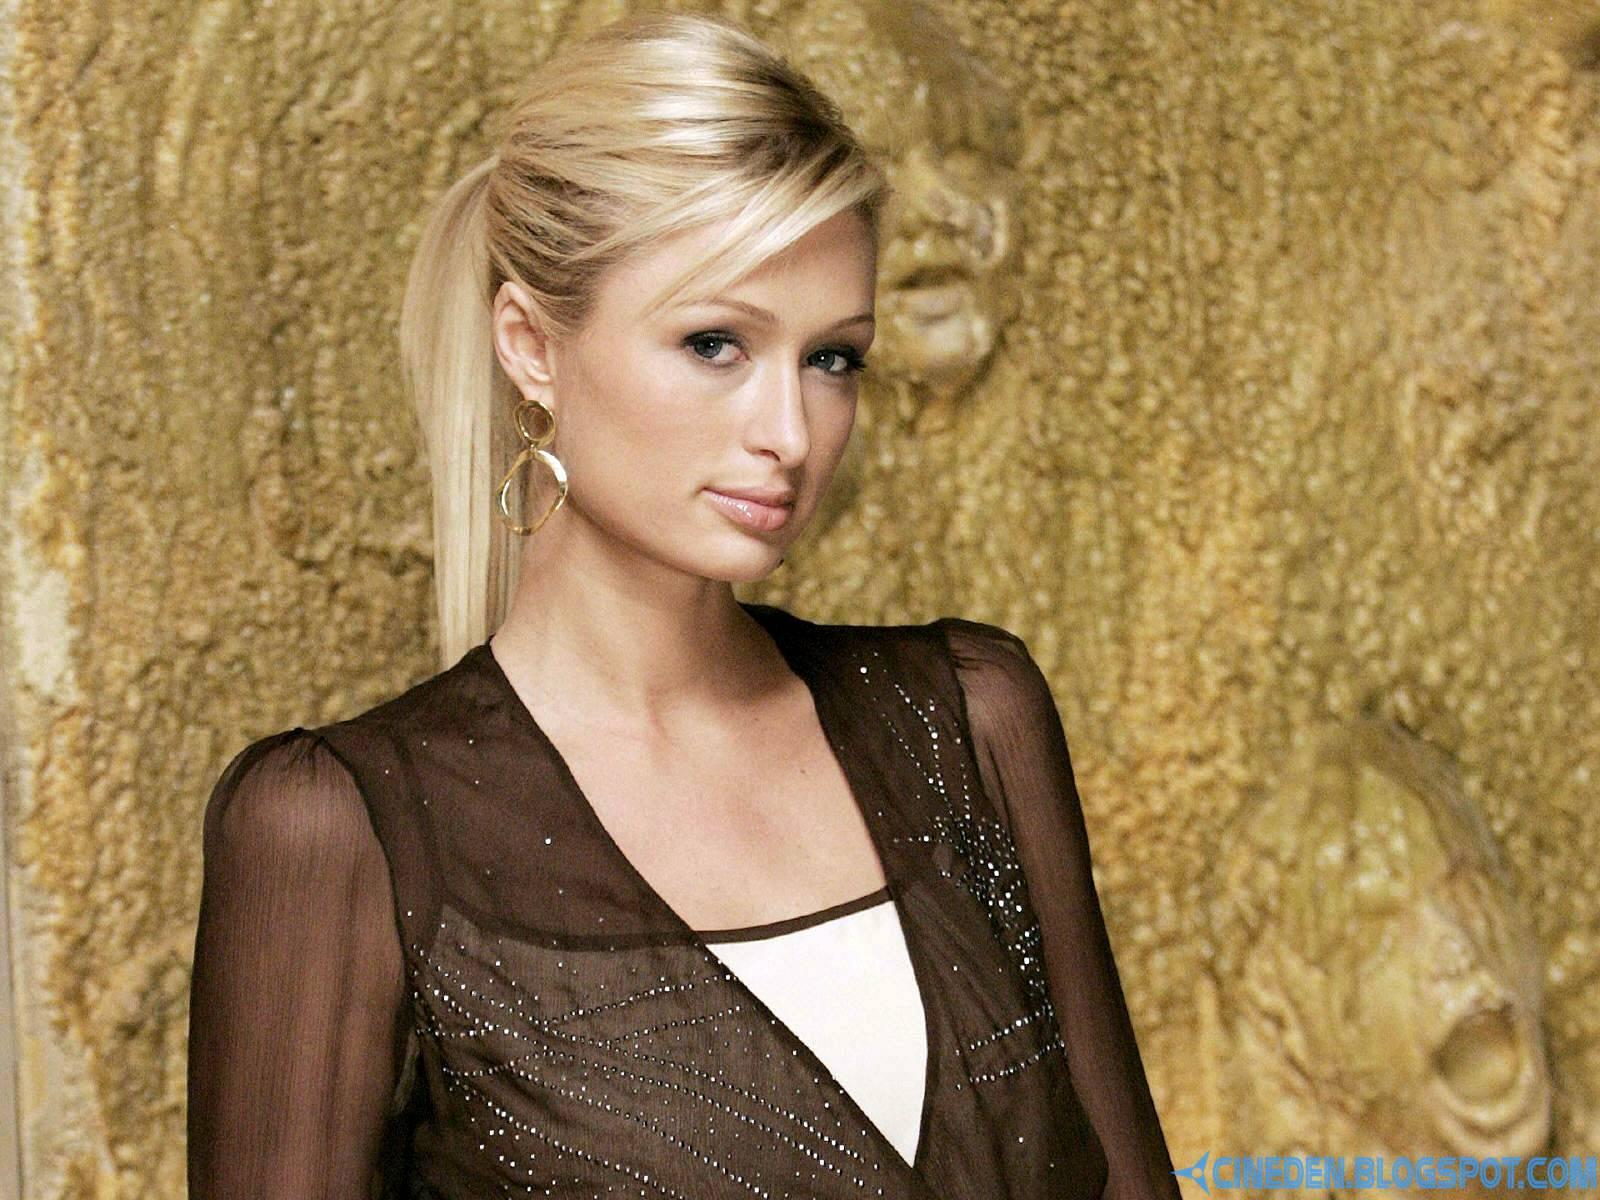 Sex tape destroyed my faith in men, says Paris Hilton - CineDen